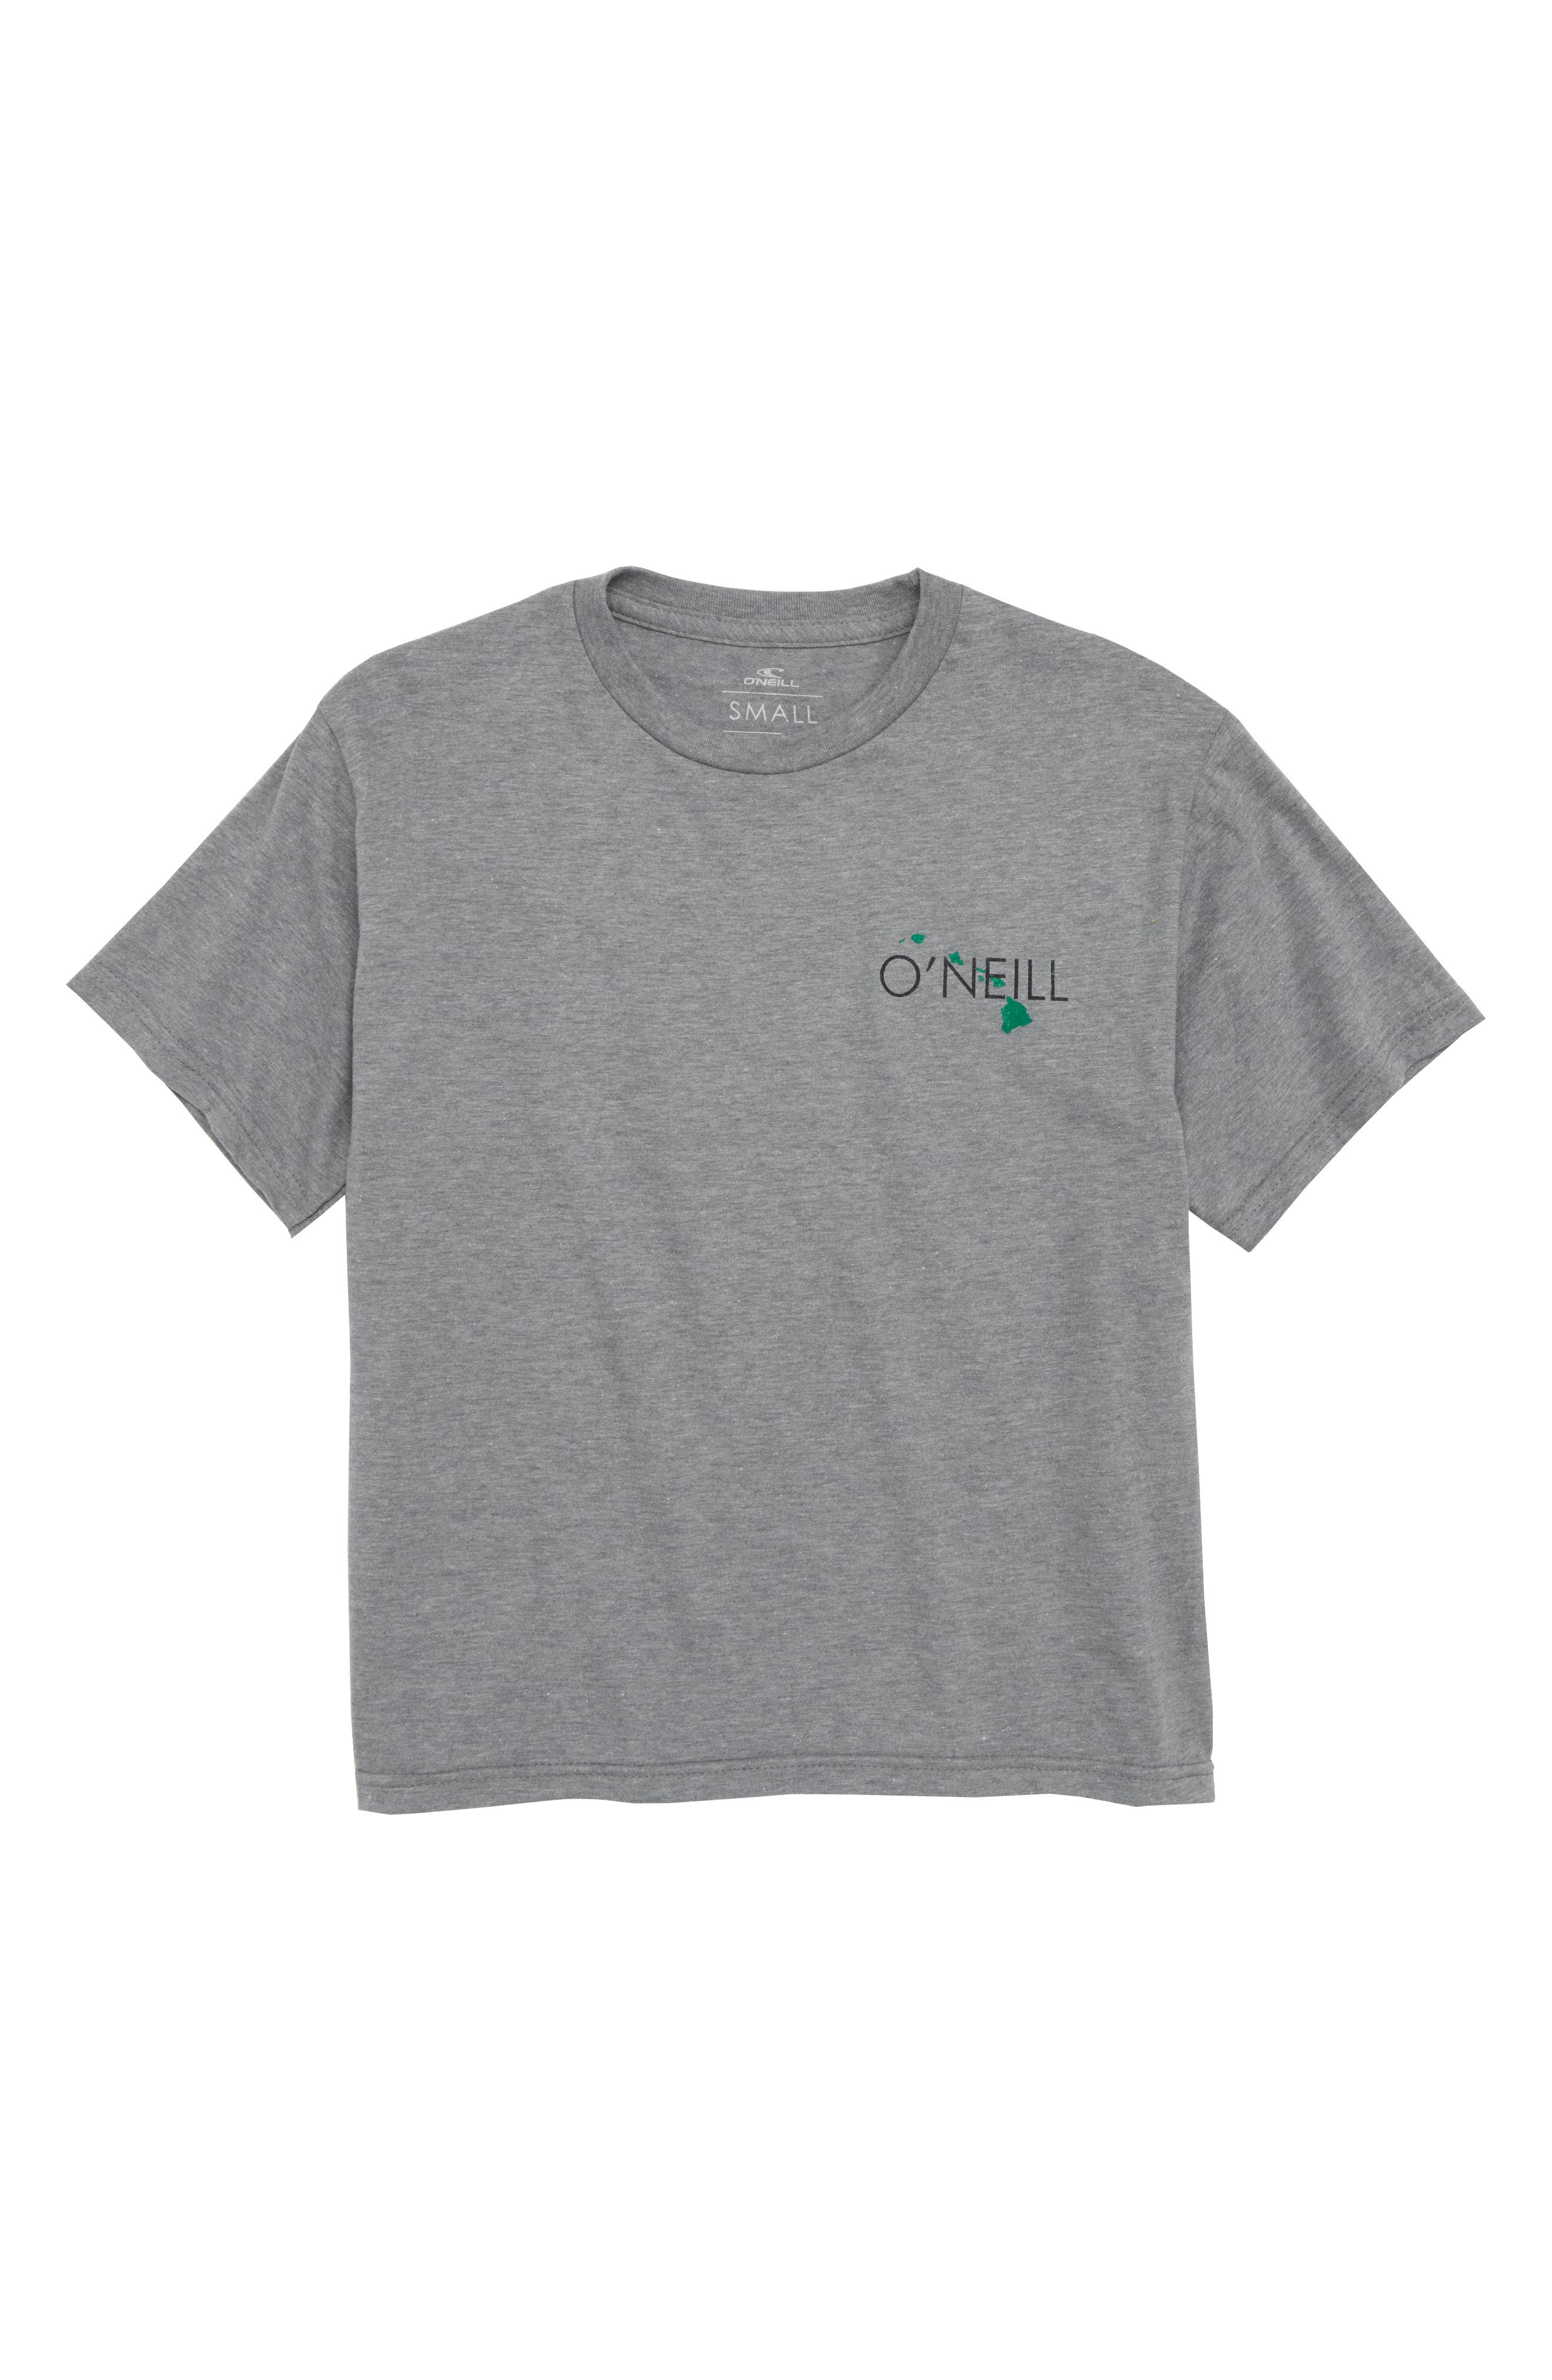 State of Aloha T-Shirt,                             Main thumbnail 1, color,                             029